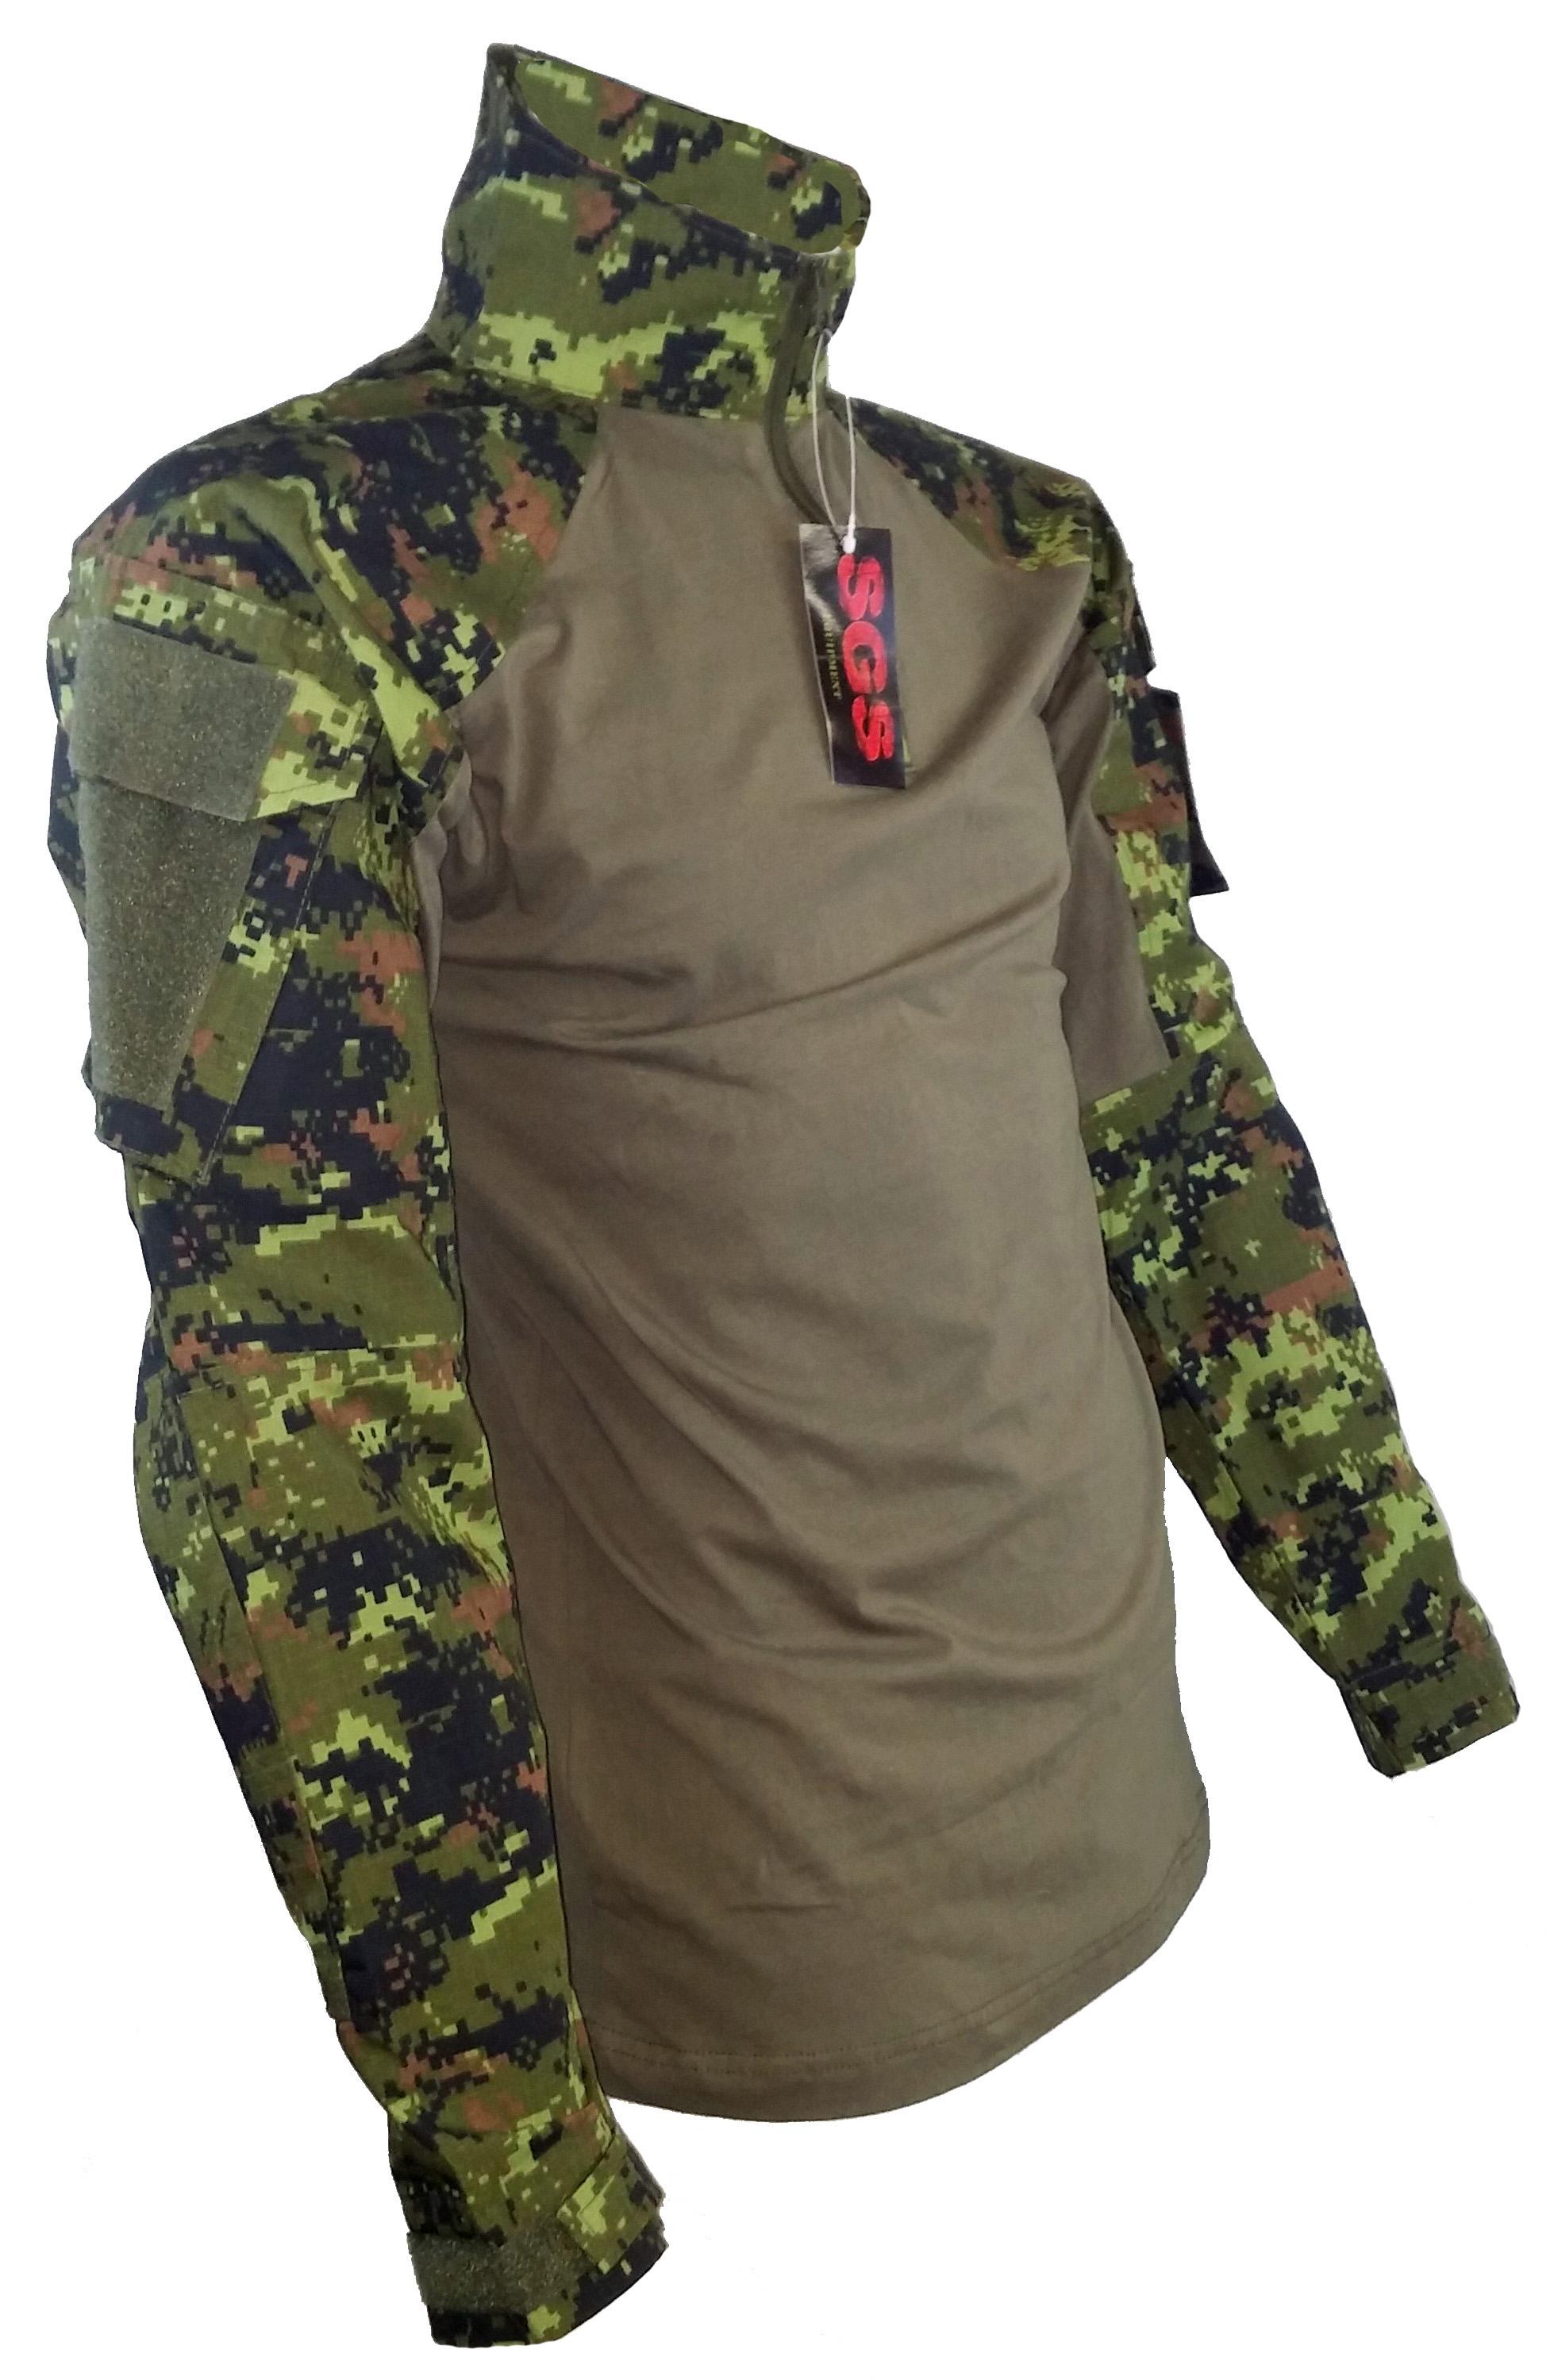 SGS Tactical sweater Canadian digital